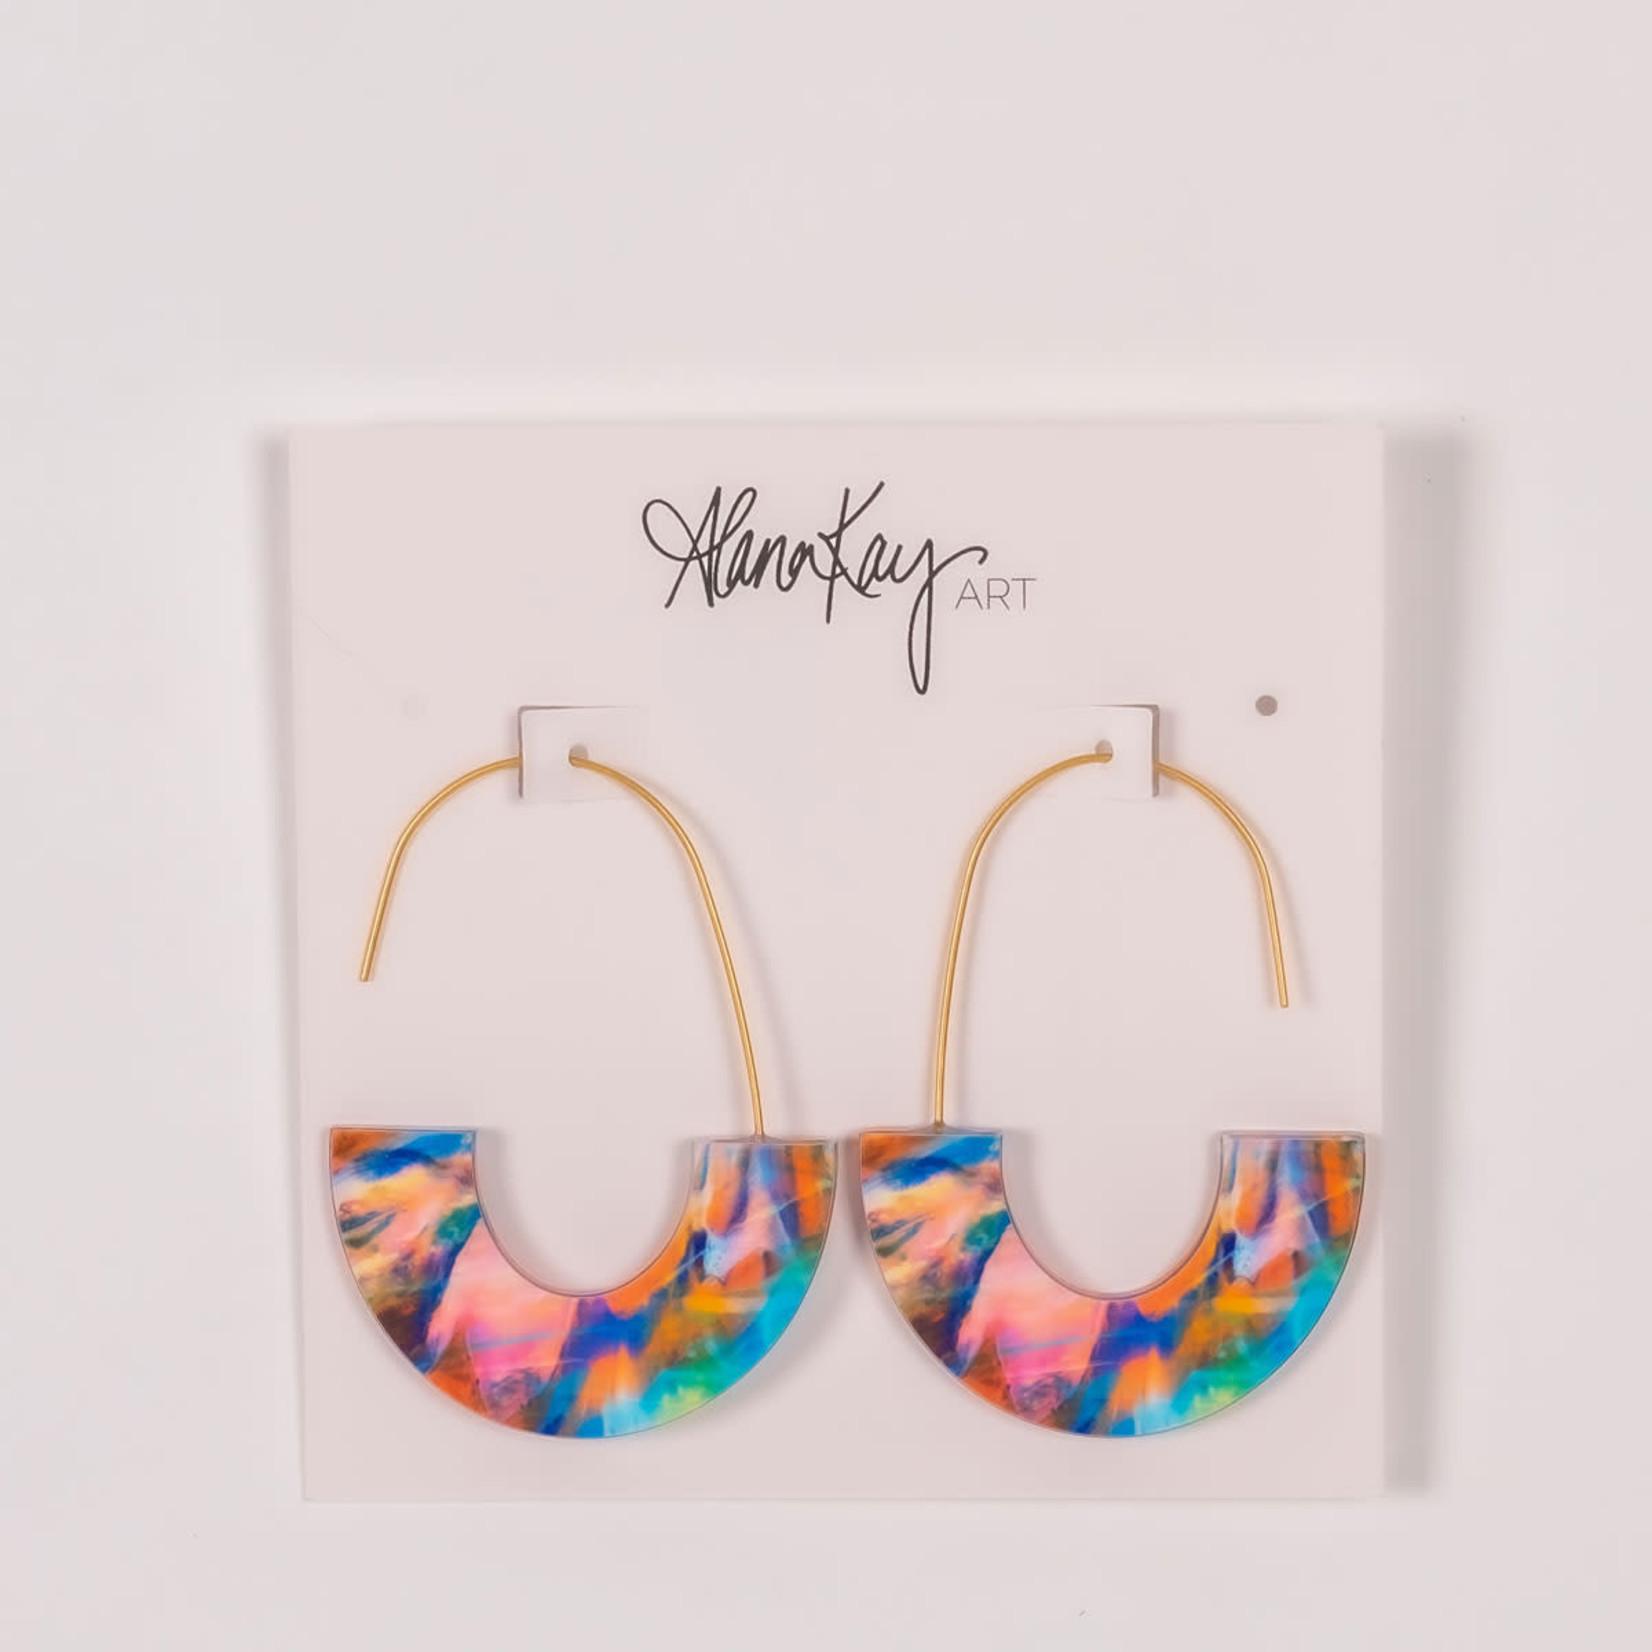 Alana Kay Art Crescent Earrings